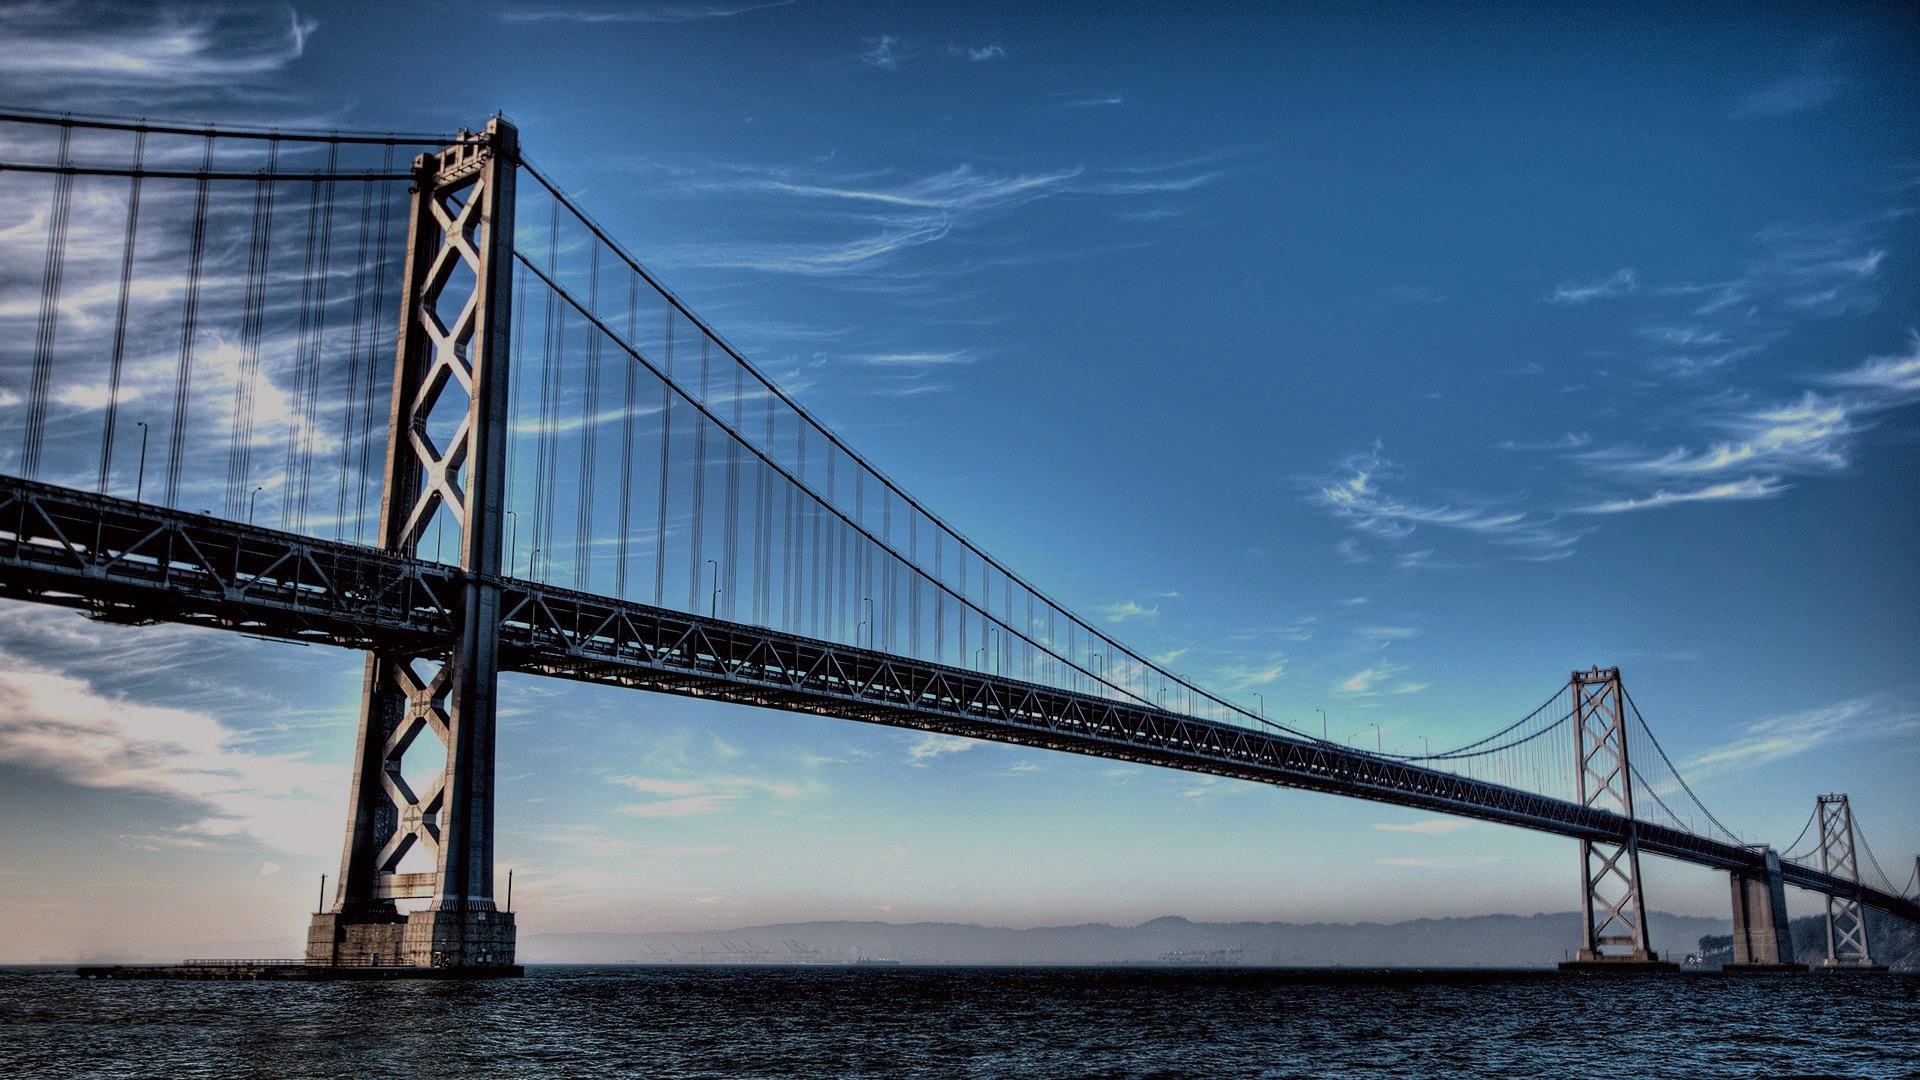 Header Image of Bridge